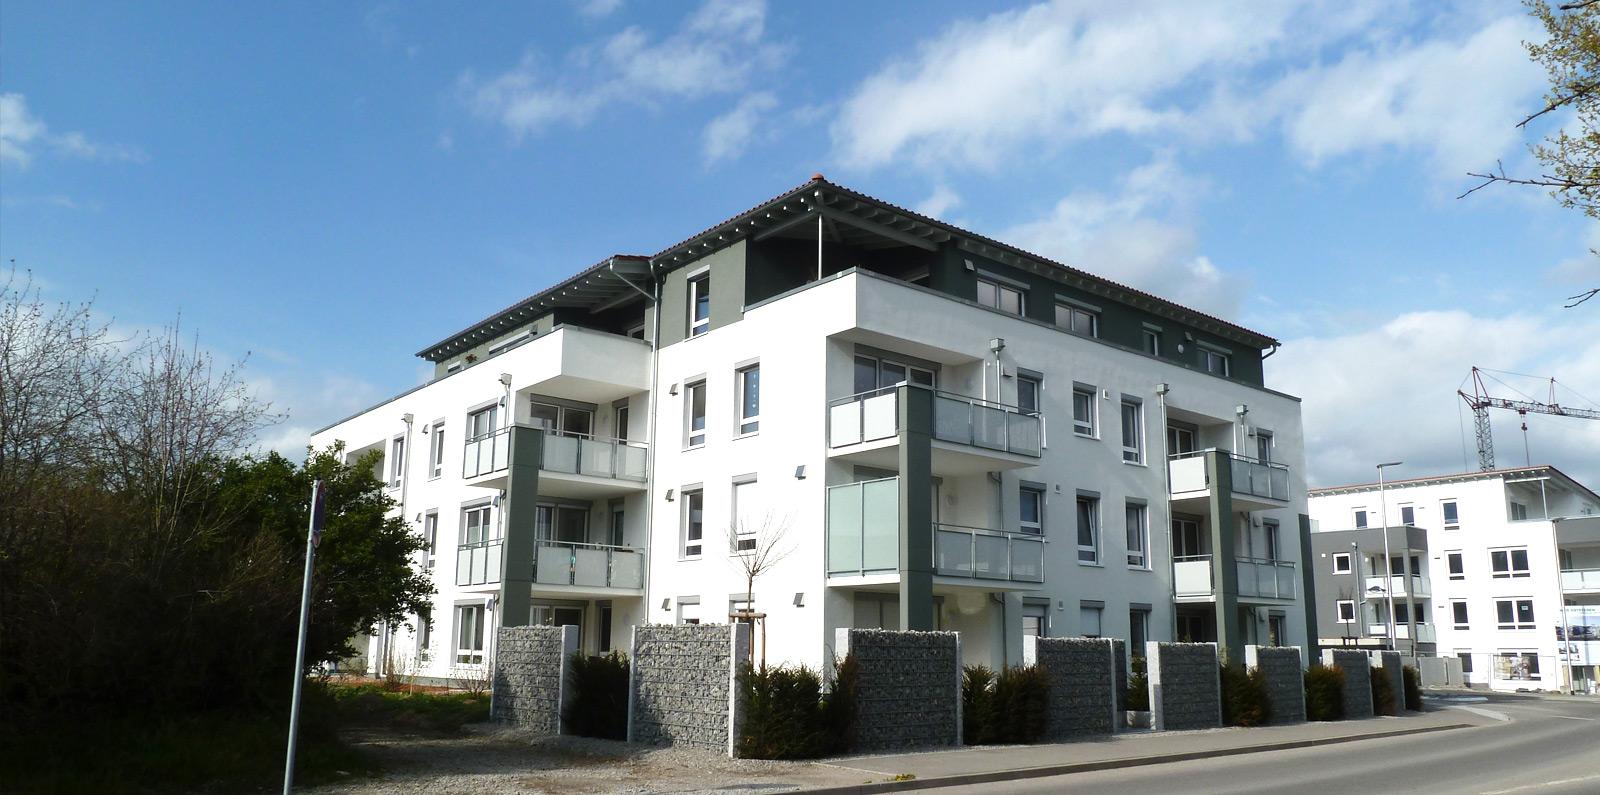 crailsheim kappel ckerstra e 1 3 r wisch wohnbau immobilien wir k mmern uns. Black Bedroom Furniture Sets. Home Design Ideas